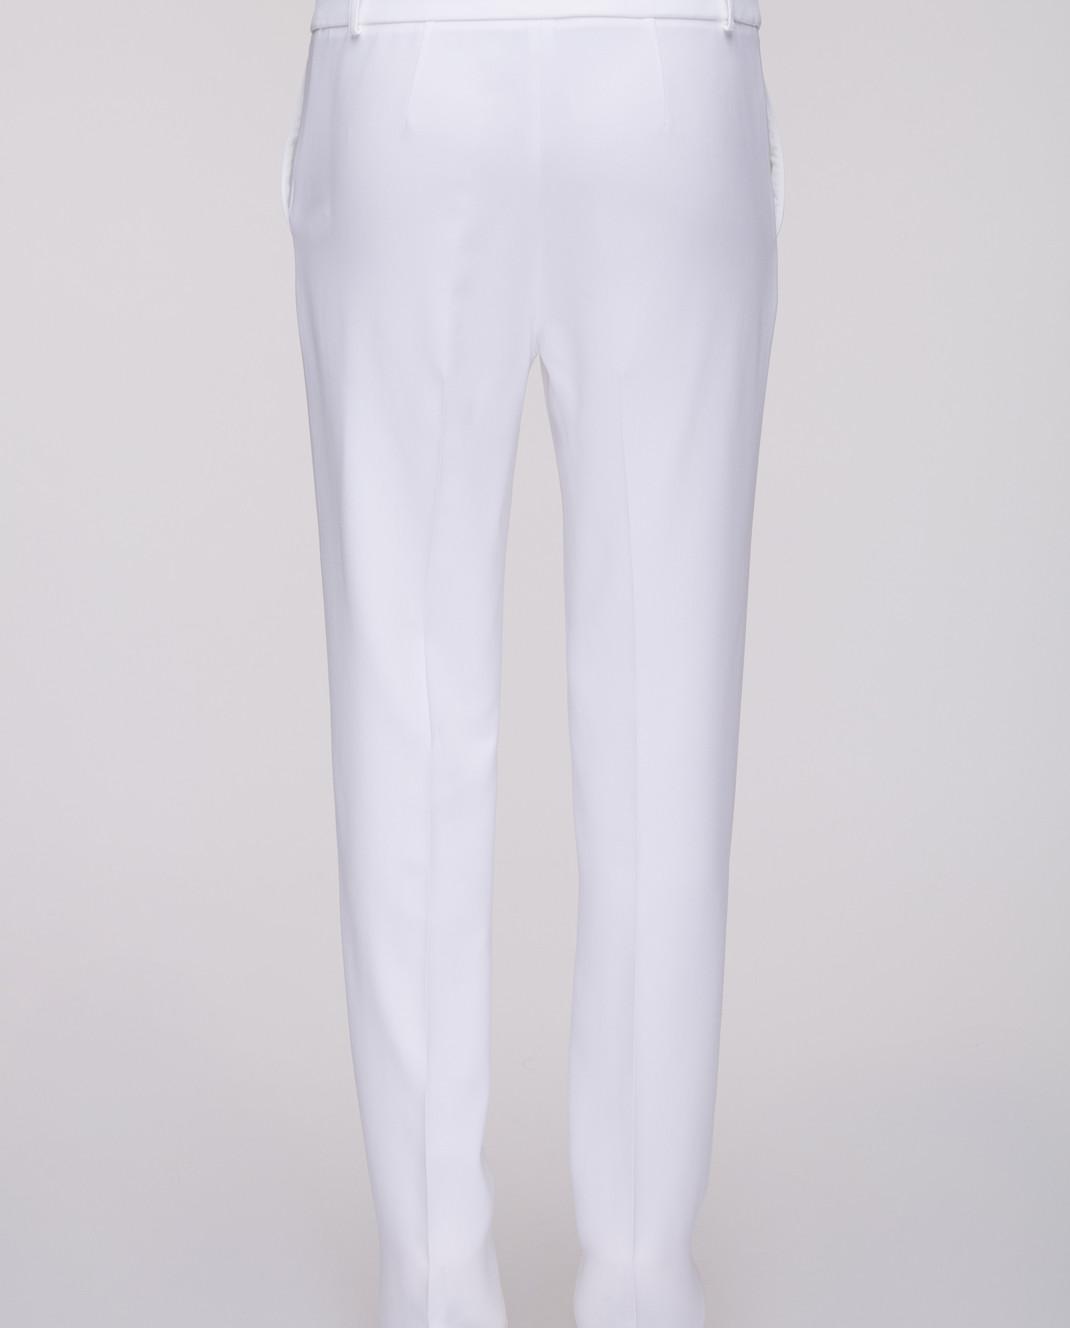 Blumarine Белые брюки 6359 изображение 4